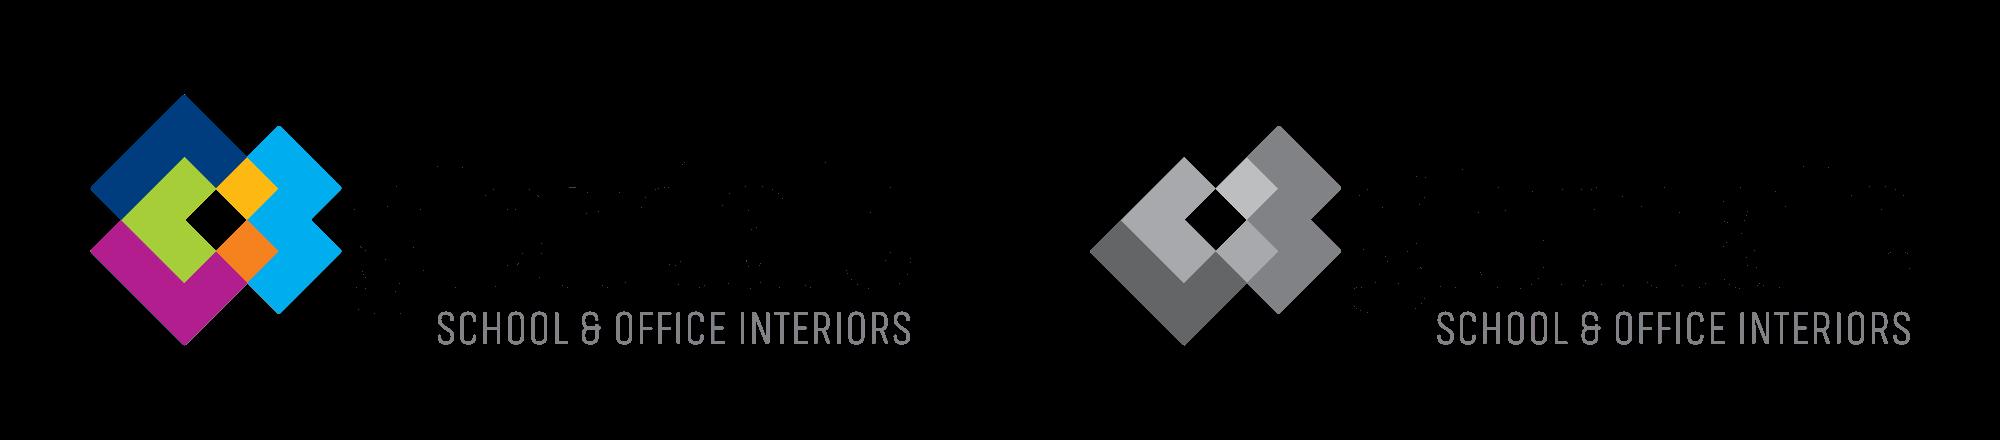 Glendale School & Office Interiors logo